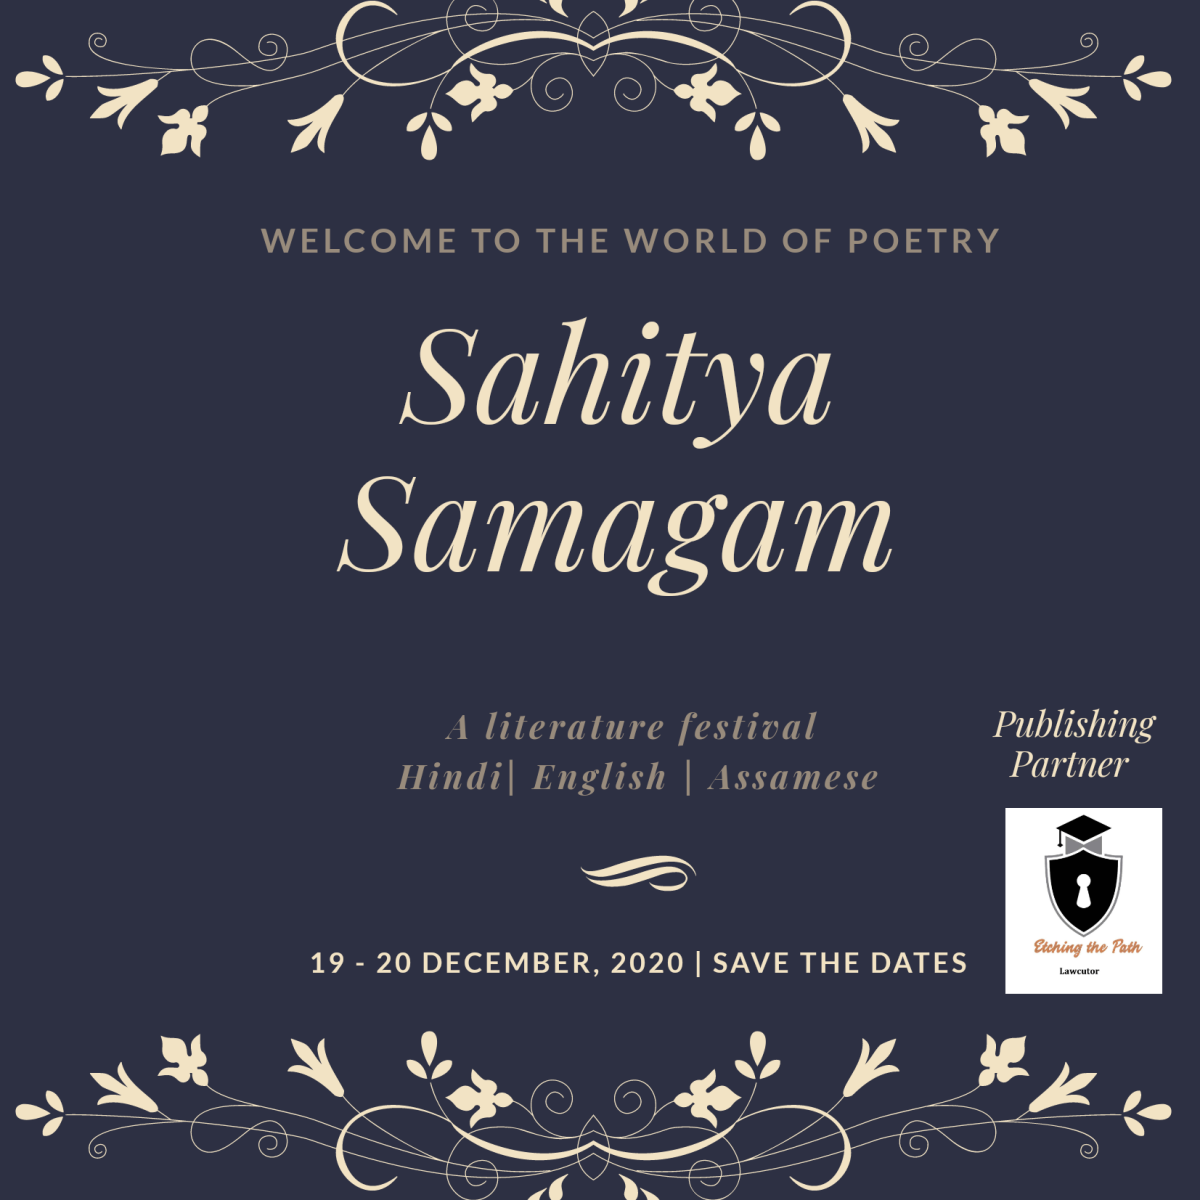 Poetry Festival of SahityaSamagam